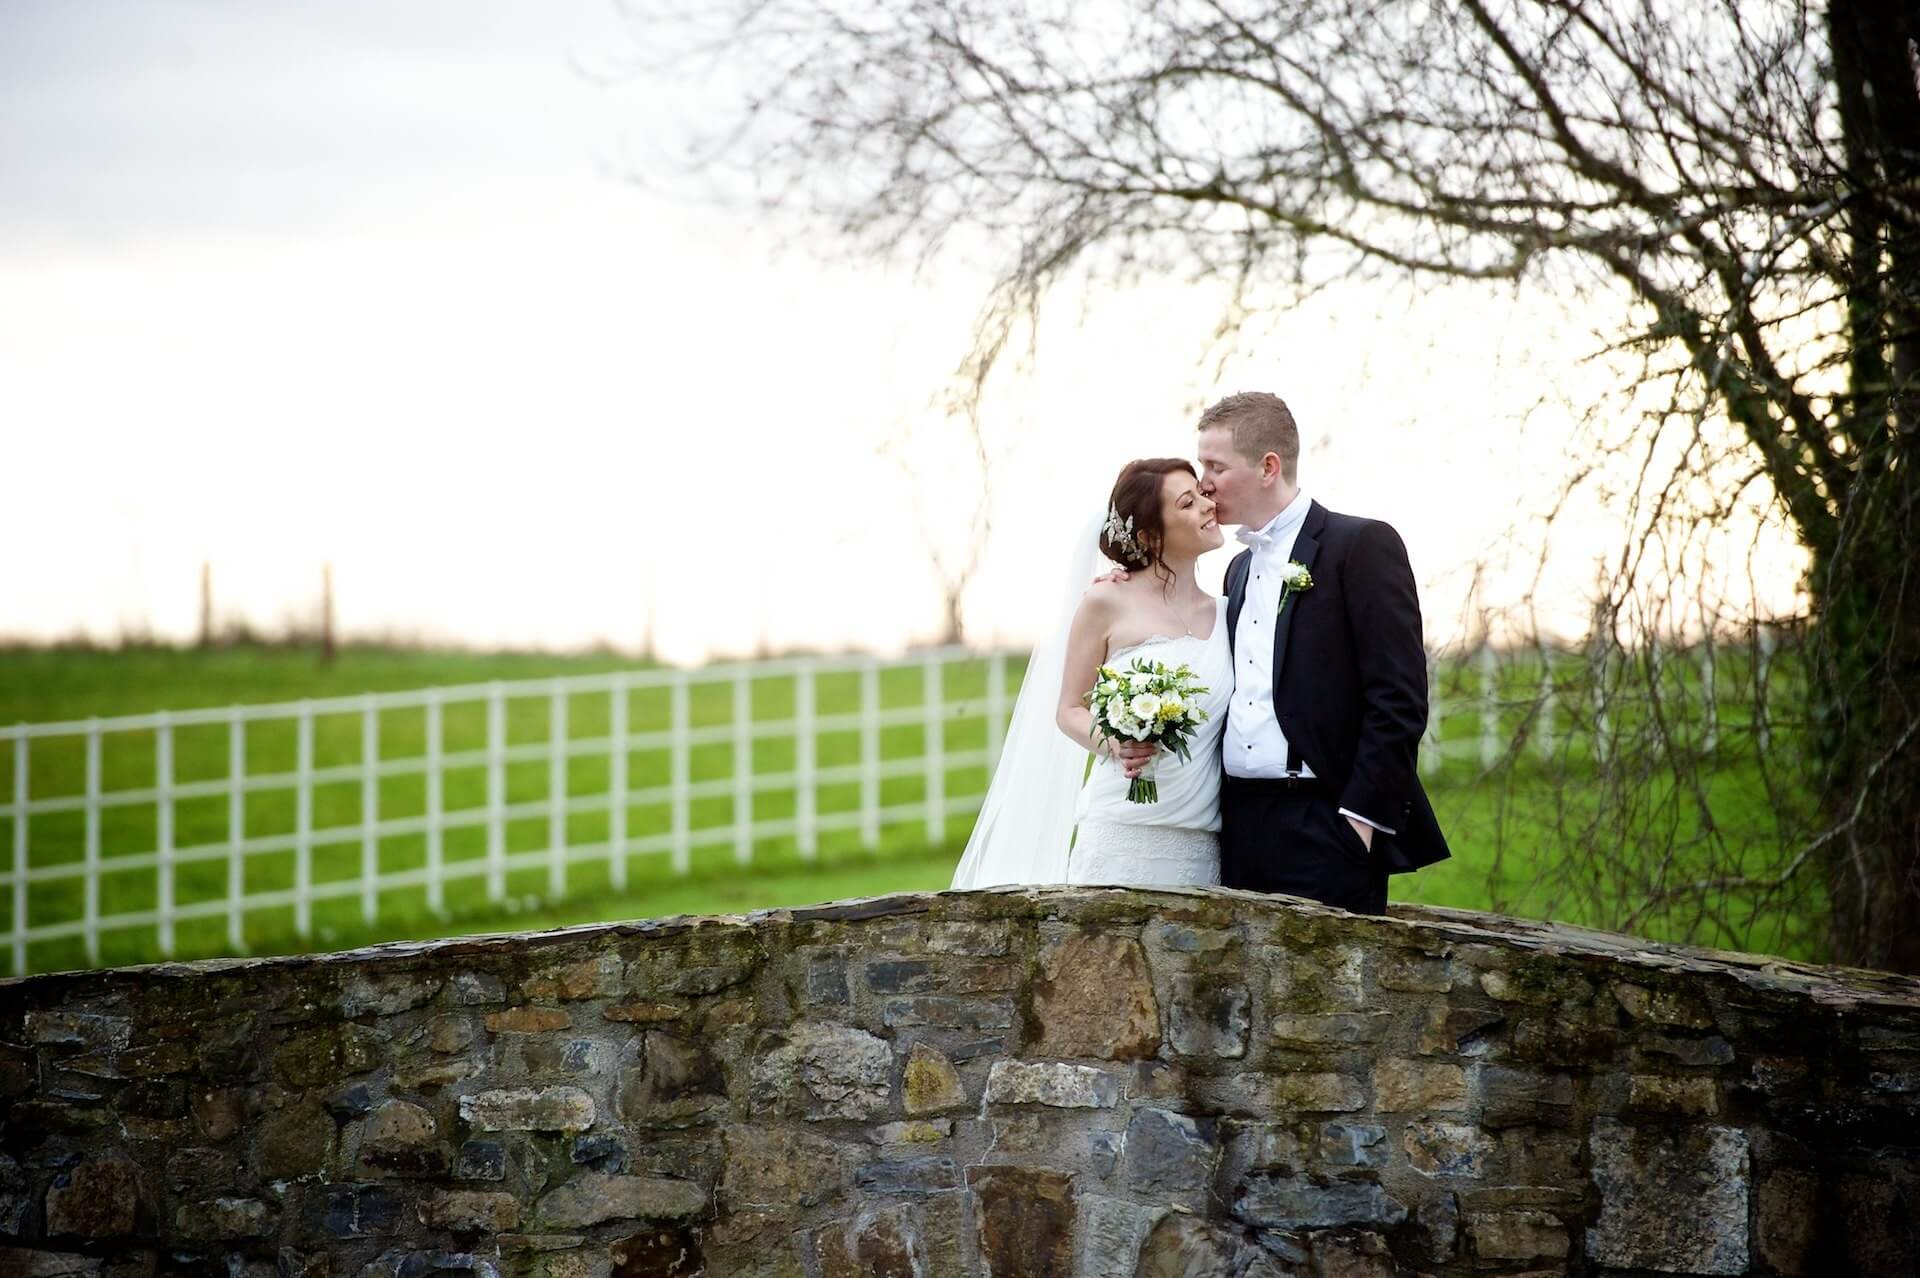 026 Wedding Meath Ballymagarvey Village Bridge